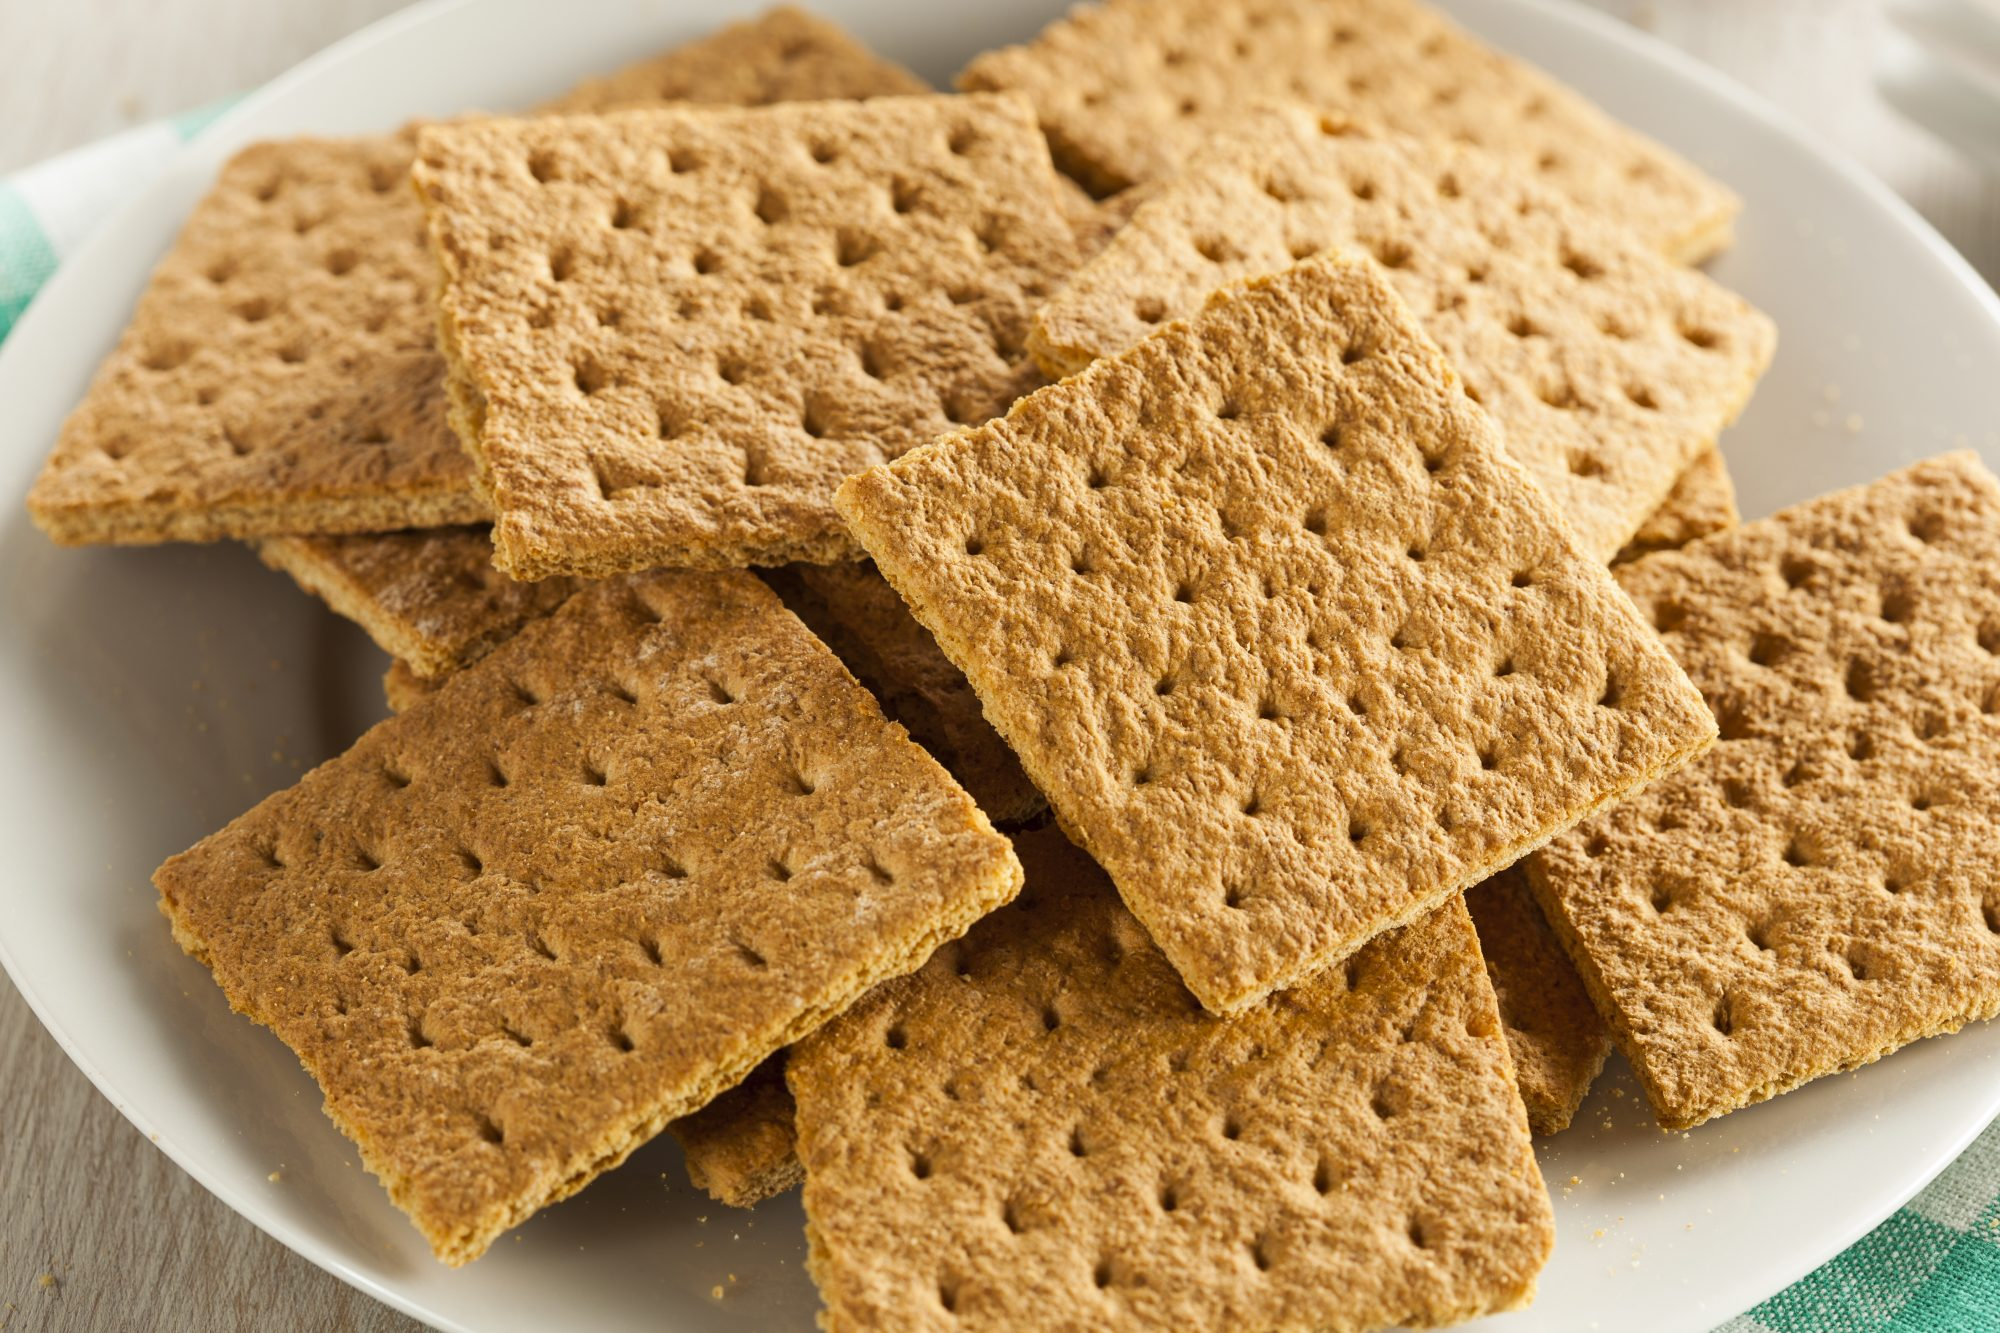 Graham crackers Getty 2/7/20